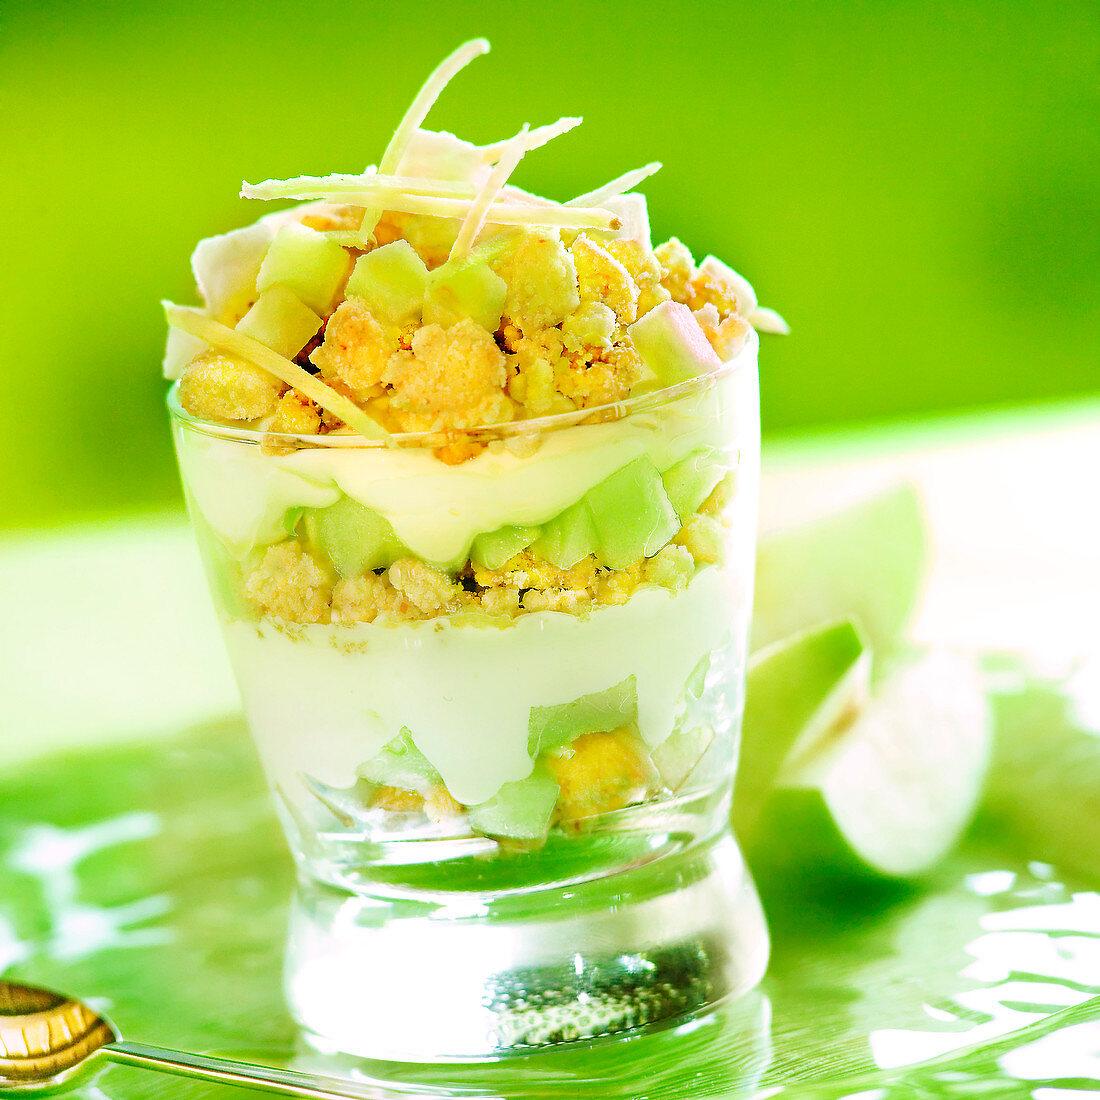 Green apple tiramisu